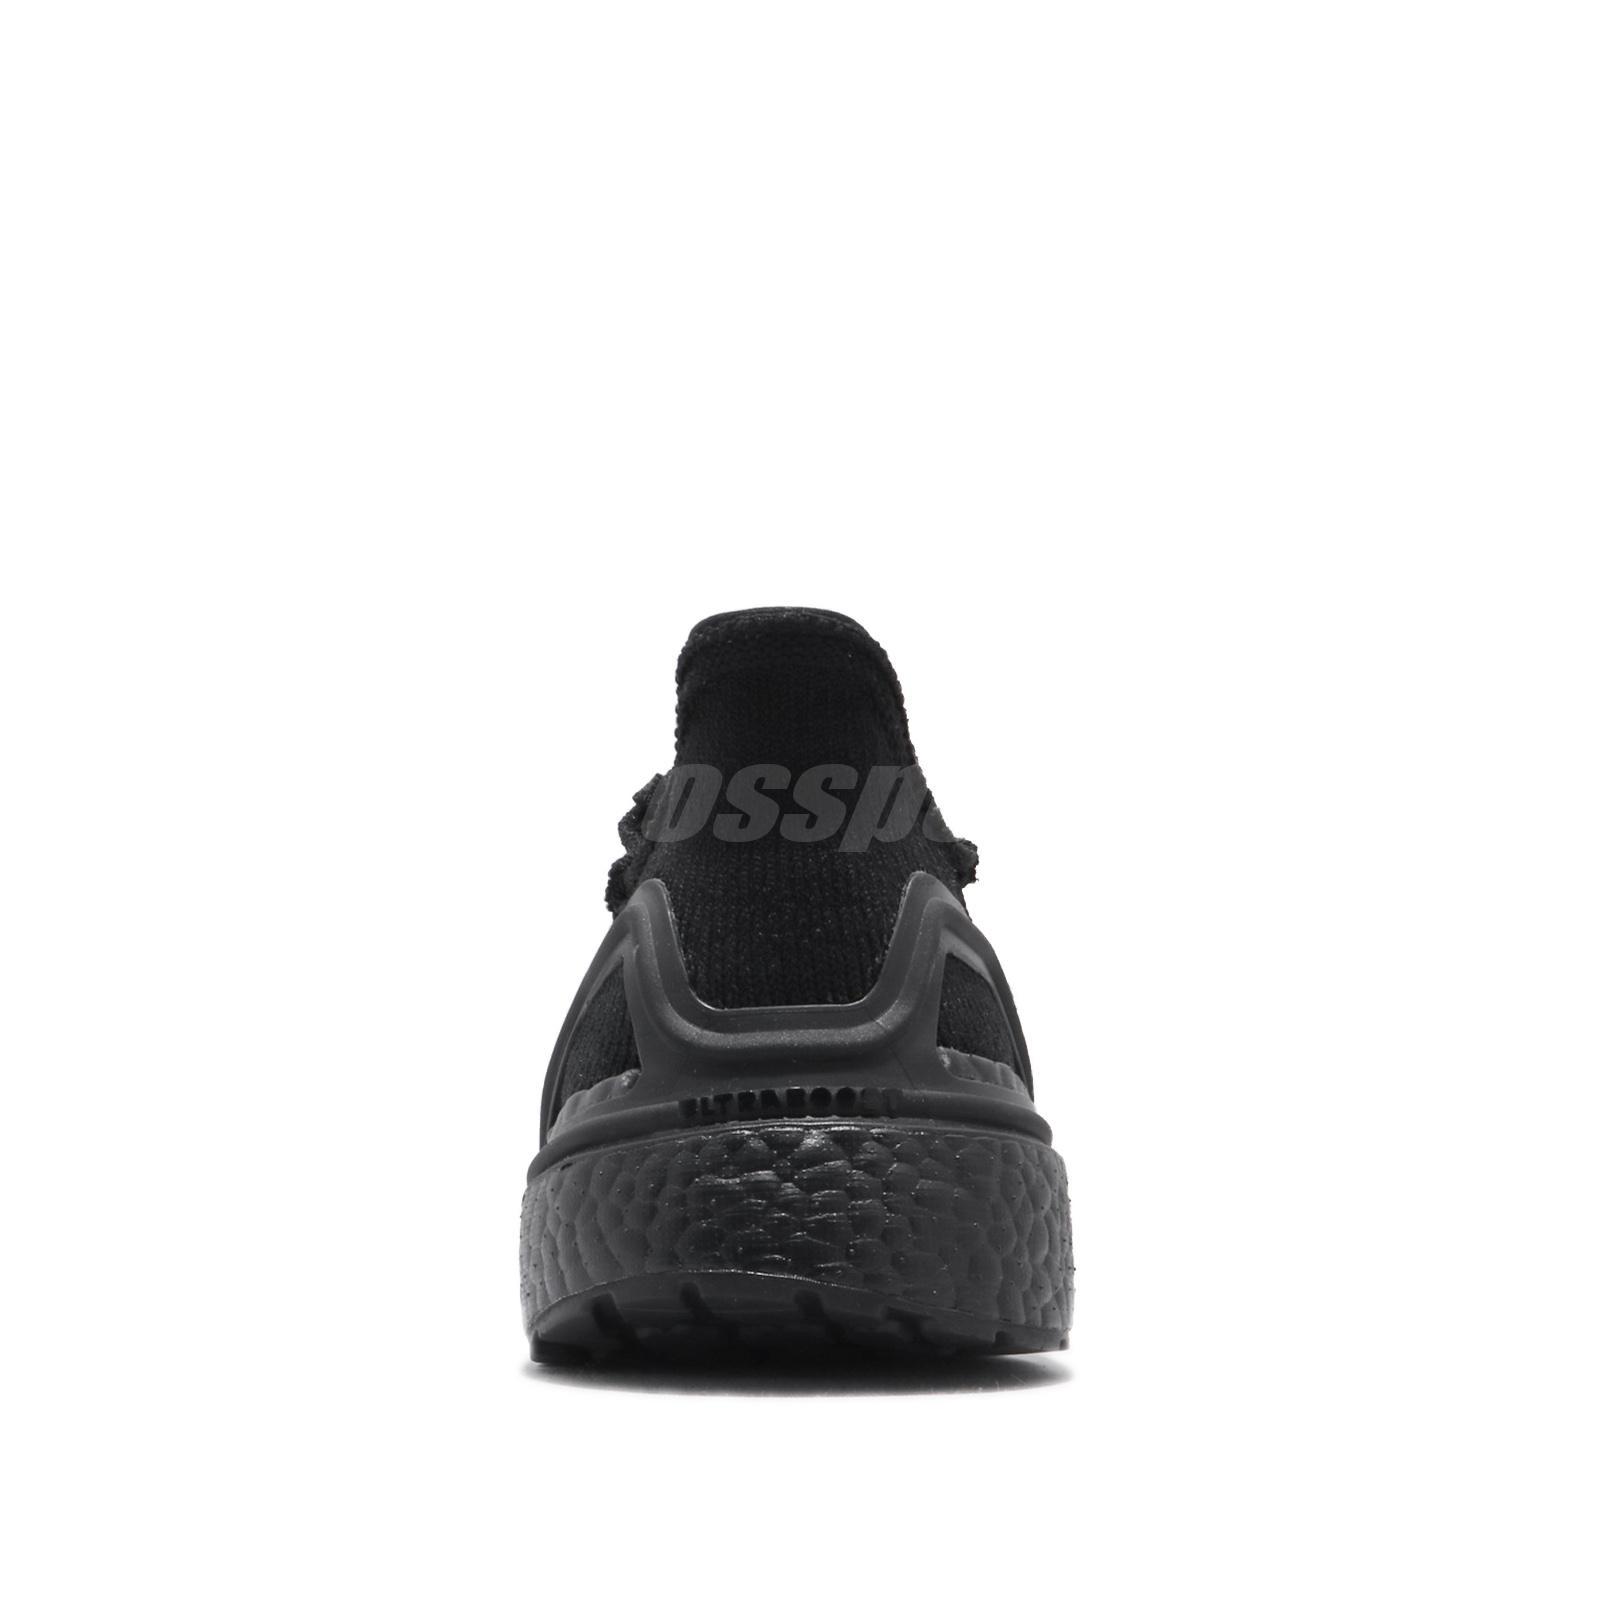 adidas UltraBoost 19 Triple Black G27508 Men Running Shoes 100%AUTHENTIC DS | eBay